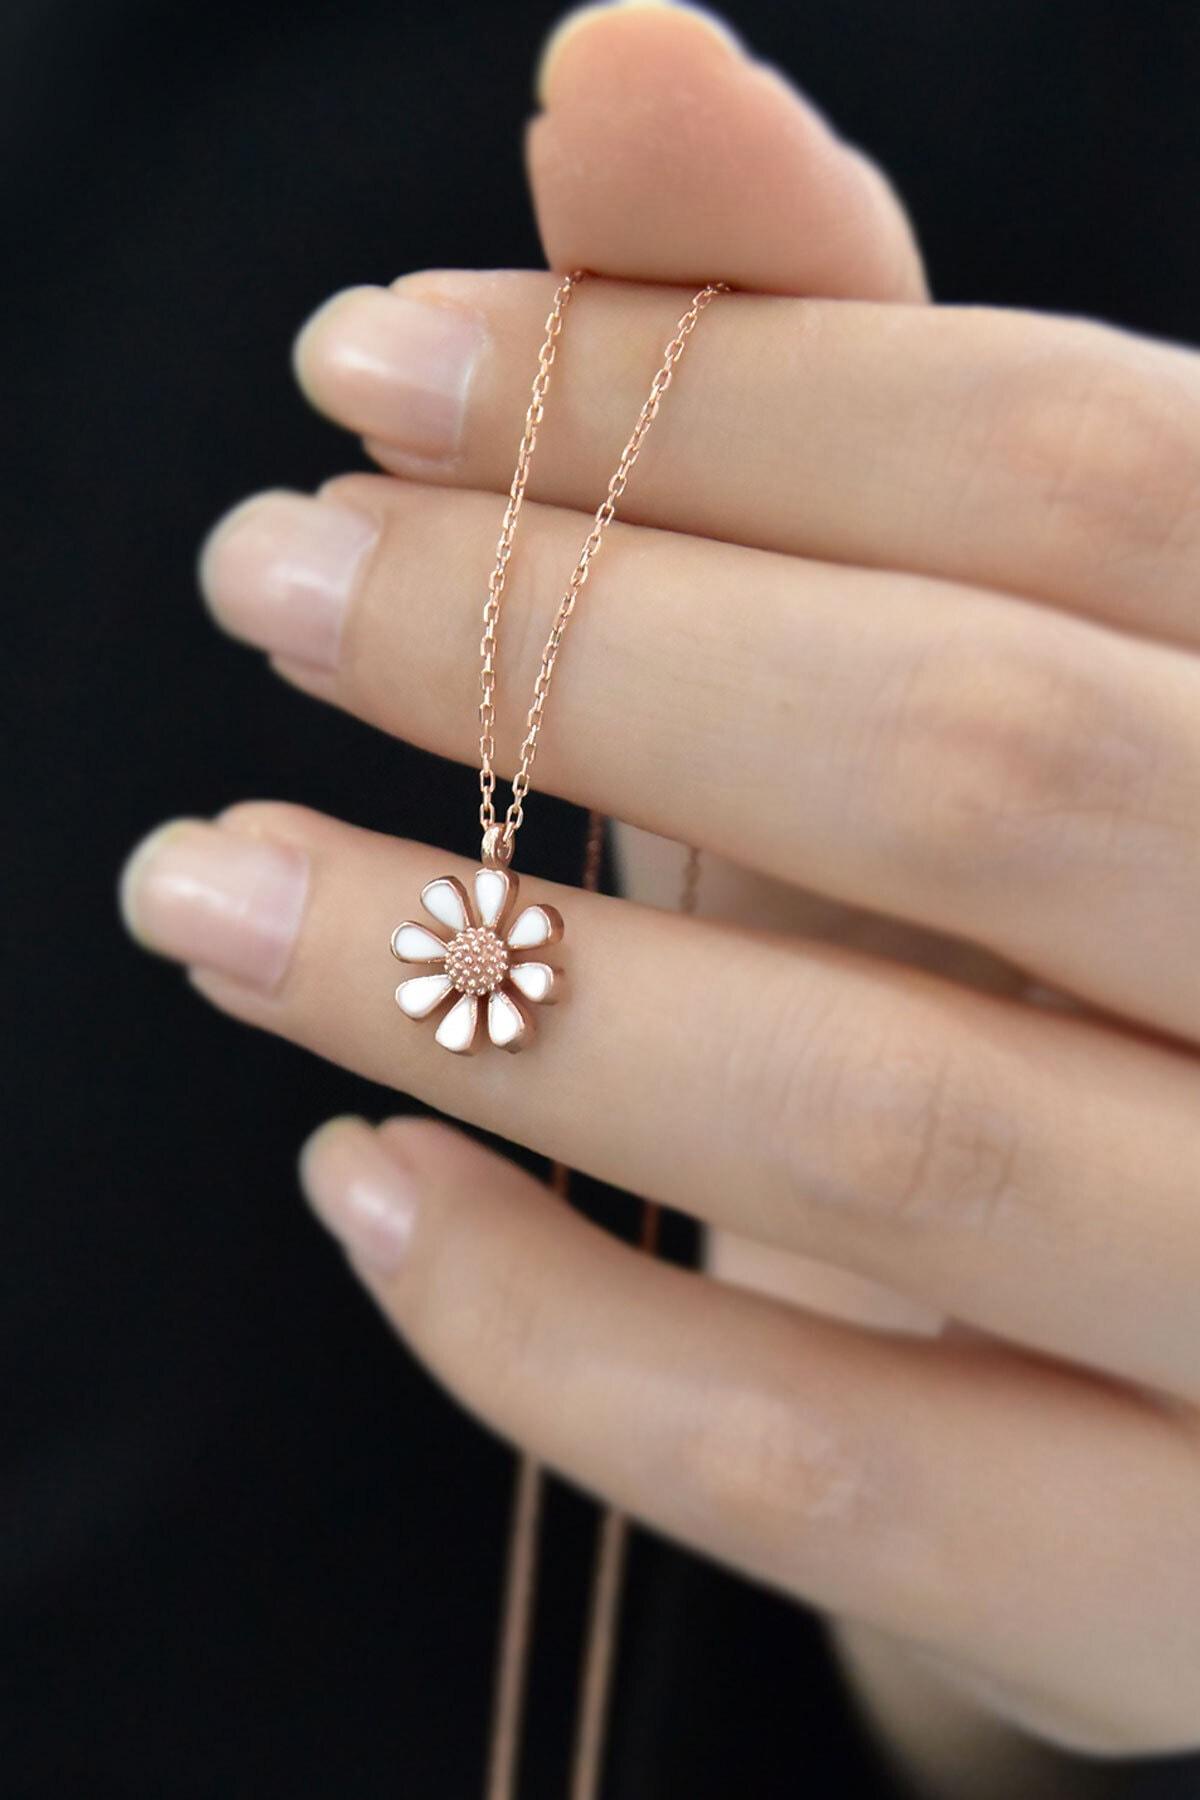 Papatya Silver 925 Ayar Gümüş Rose Kaplama Mineli Papatya Kolye 1